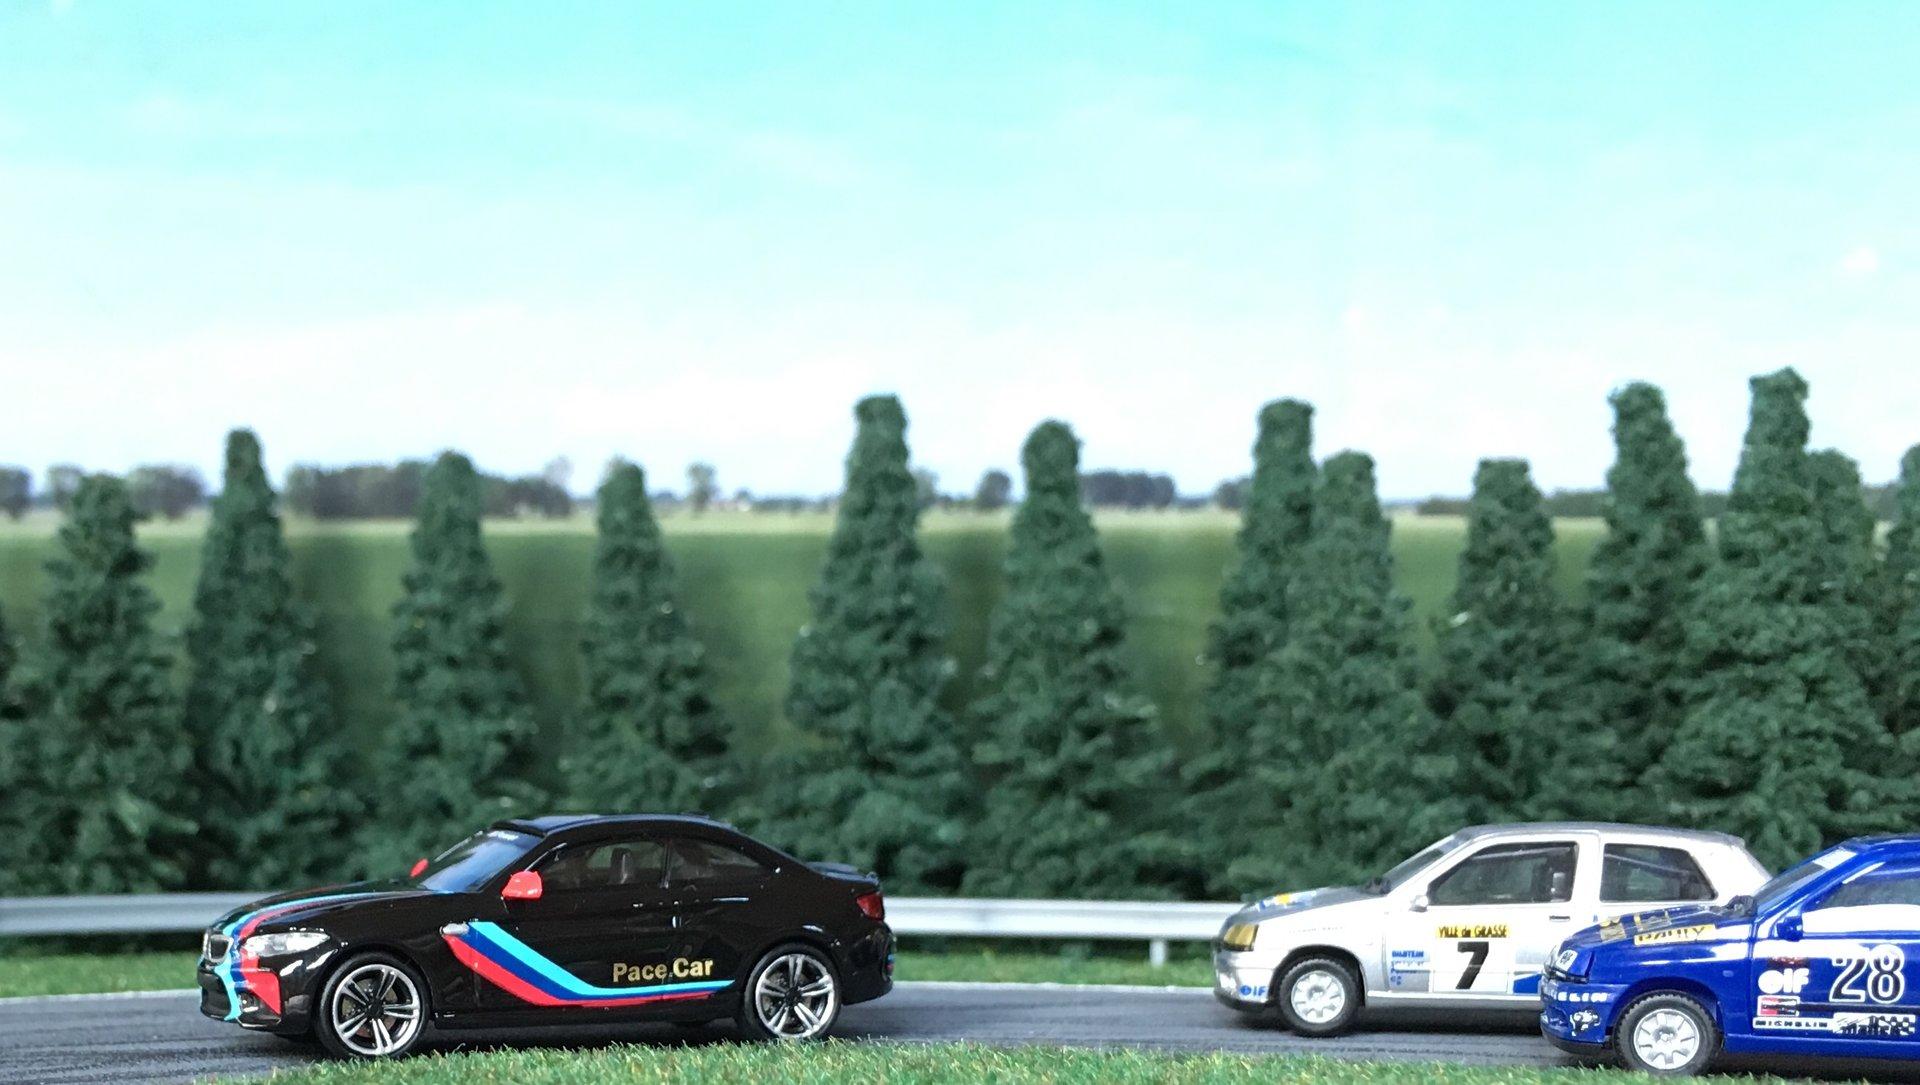 BMW M2 Pace car 006.jpg